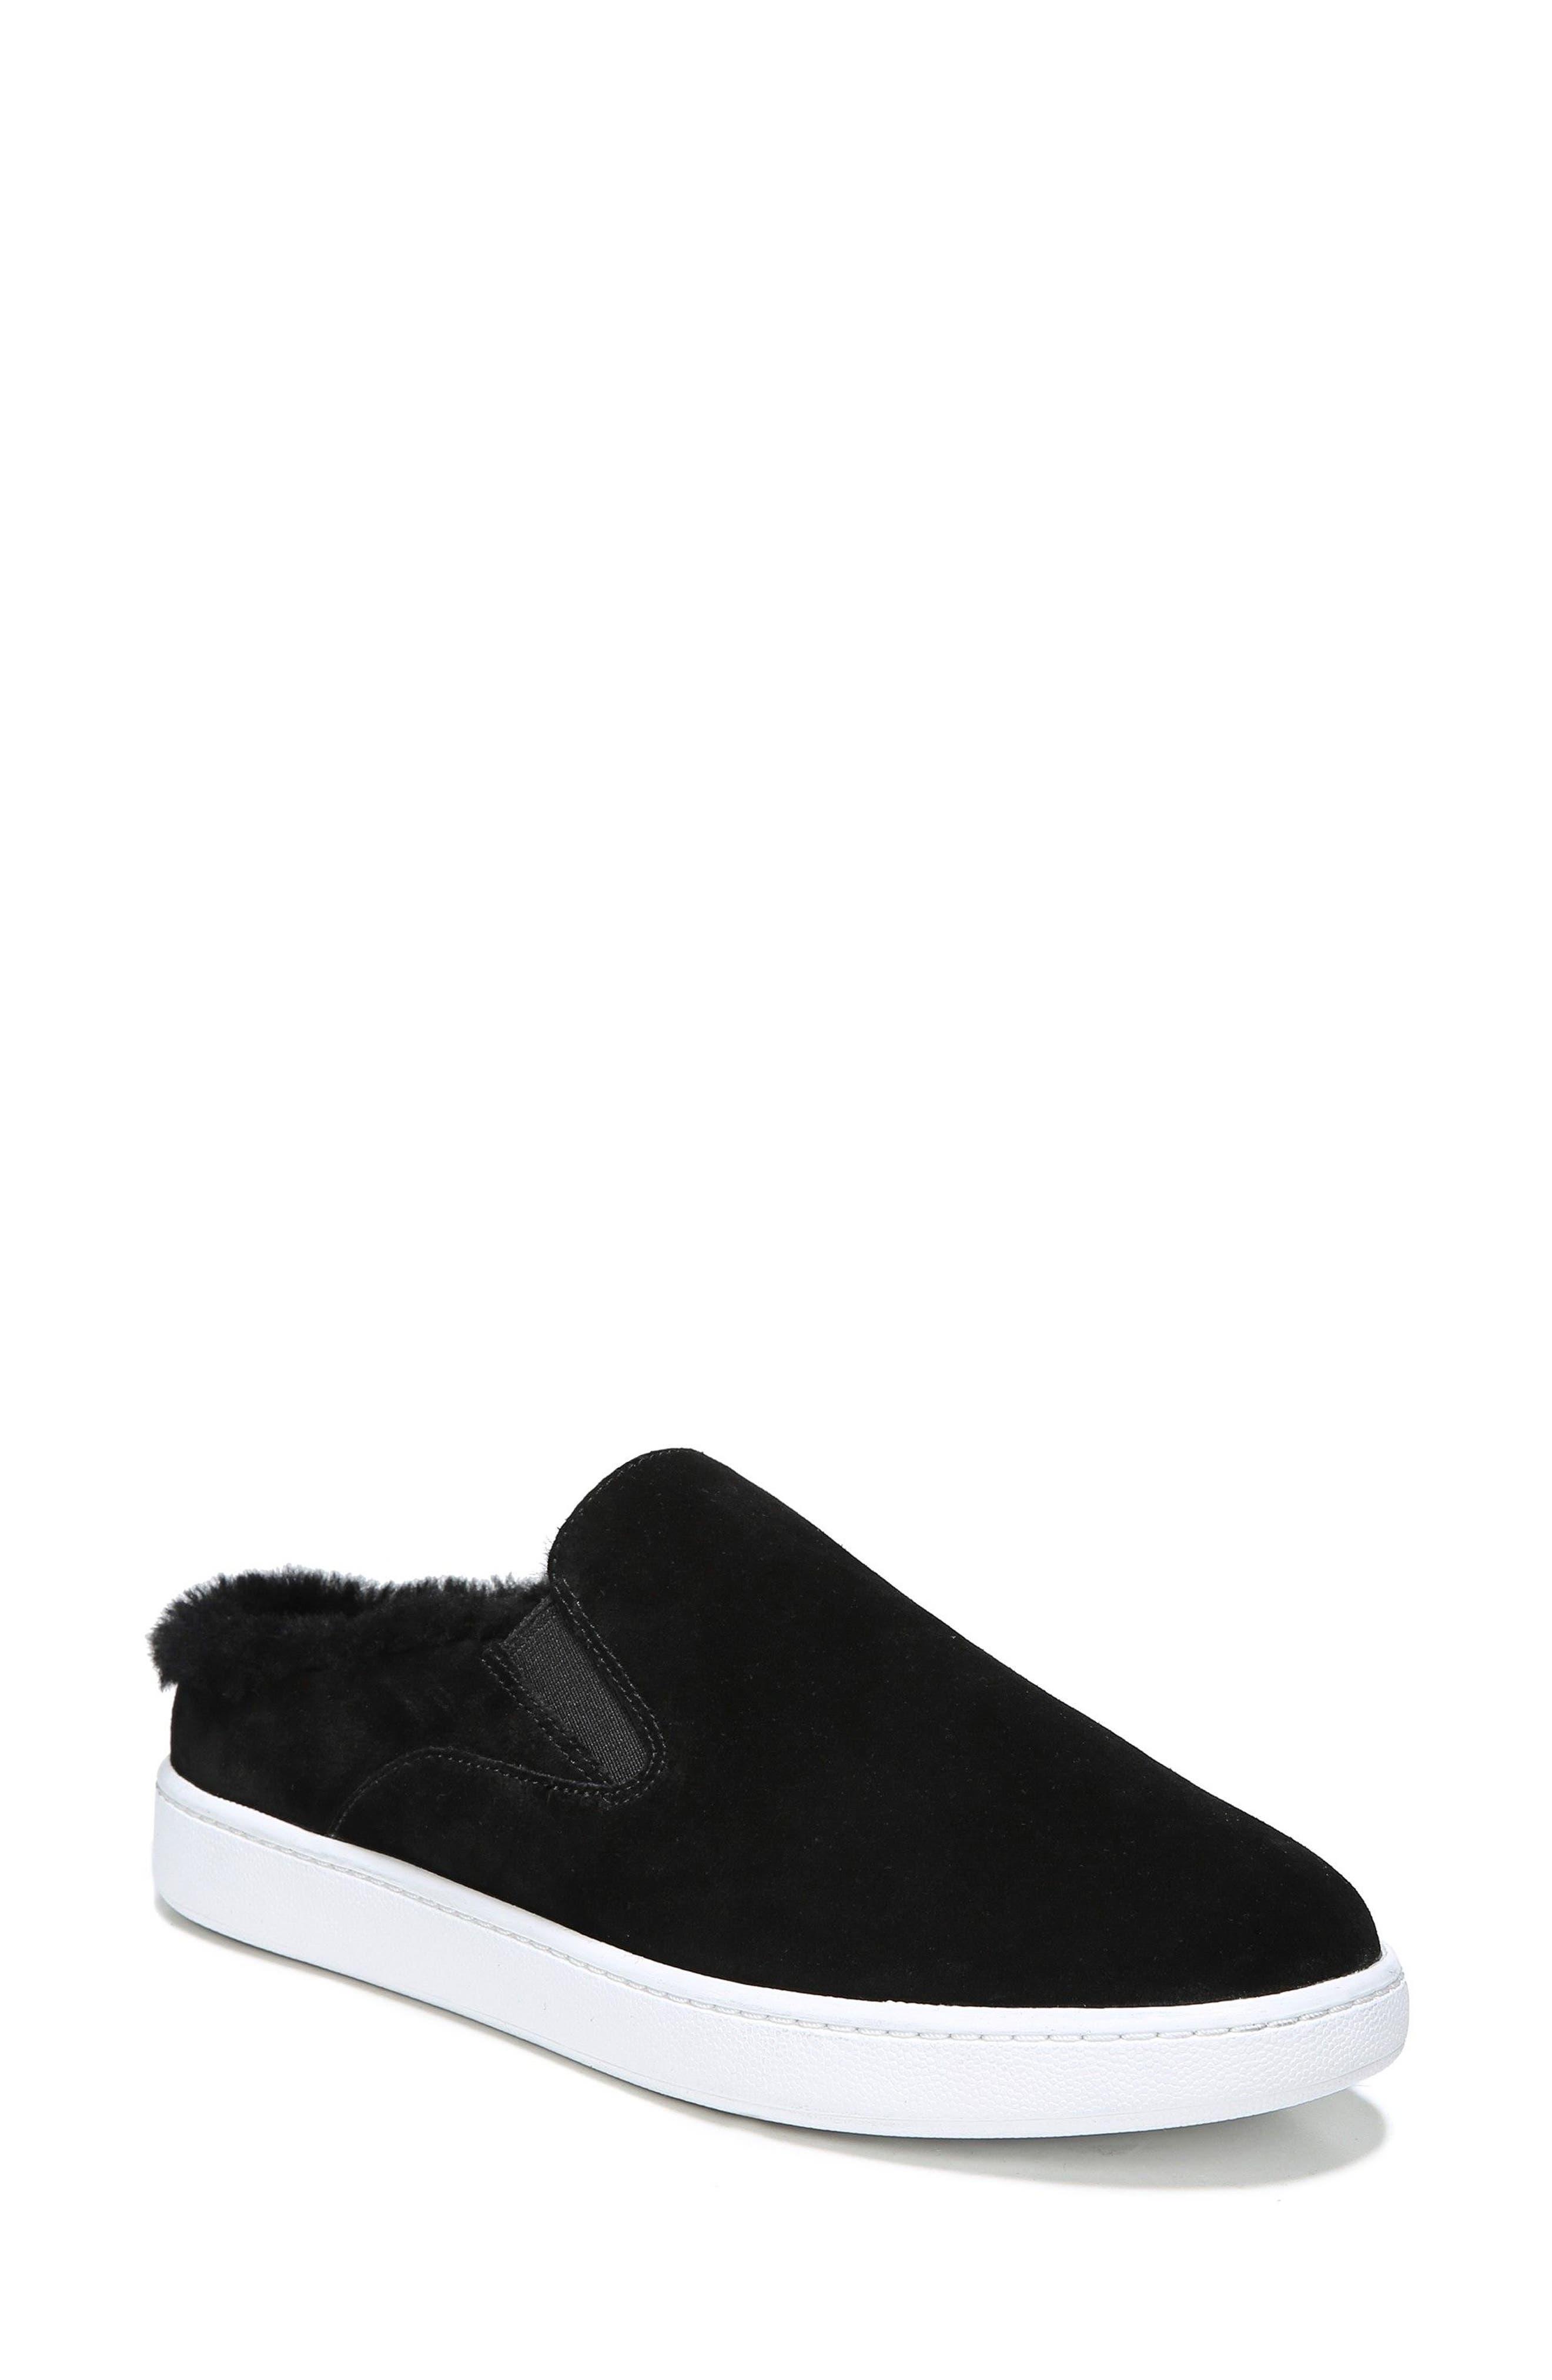 Verrell Genuine Shearling Slip-On Sneaker,                         Main,                         color, 001